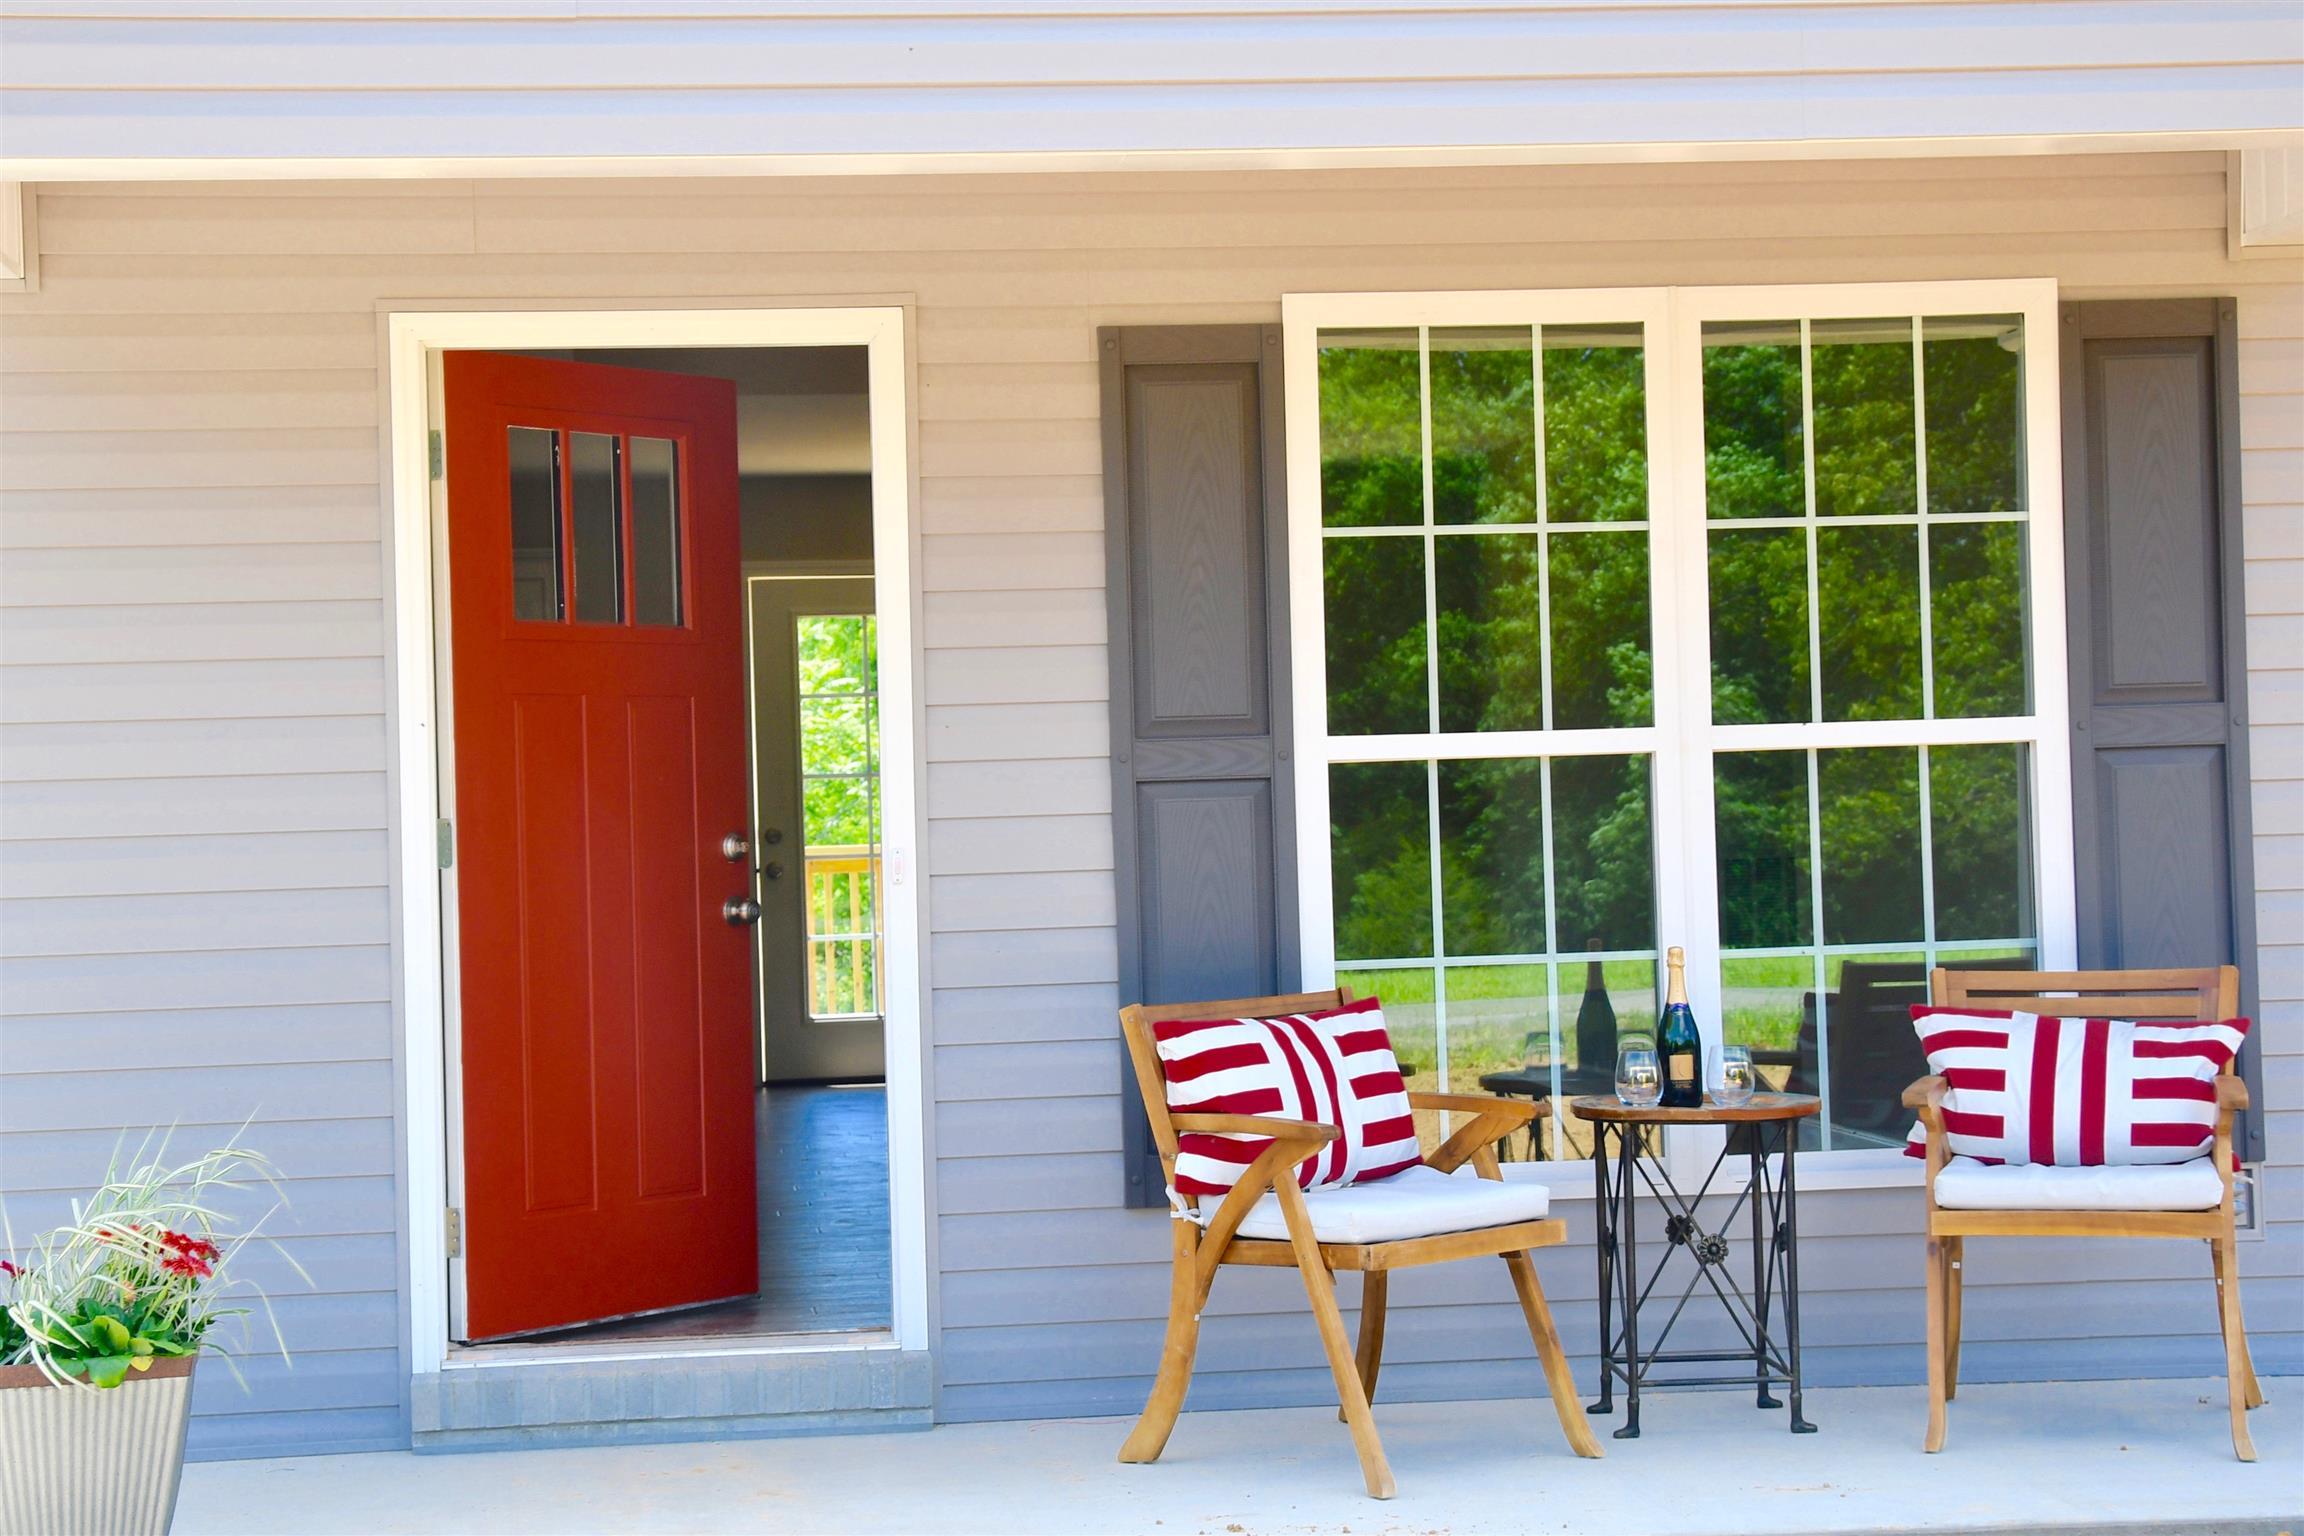 33 Annette Lane, Lawrenceburg, TN 38464 - Lawrenceburg, TN real estate listing